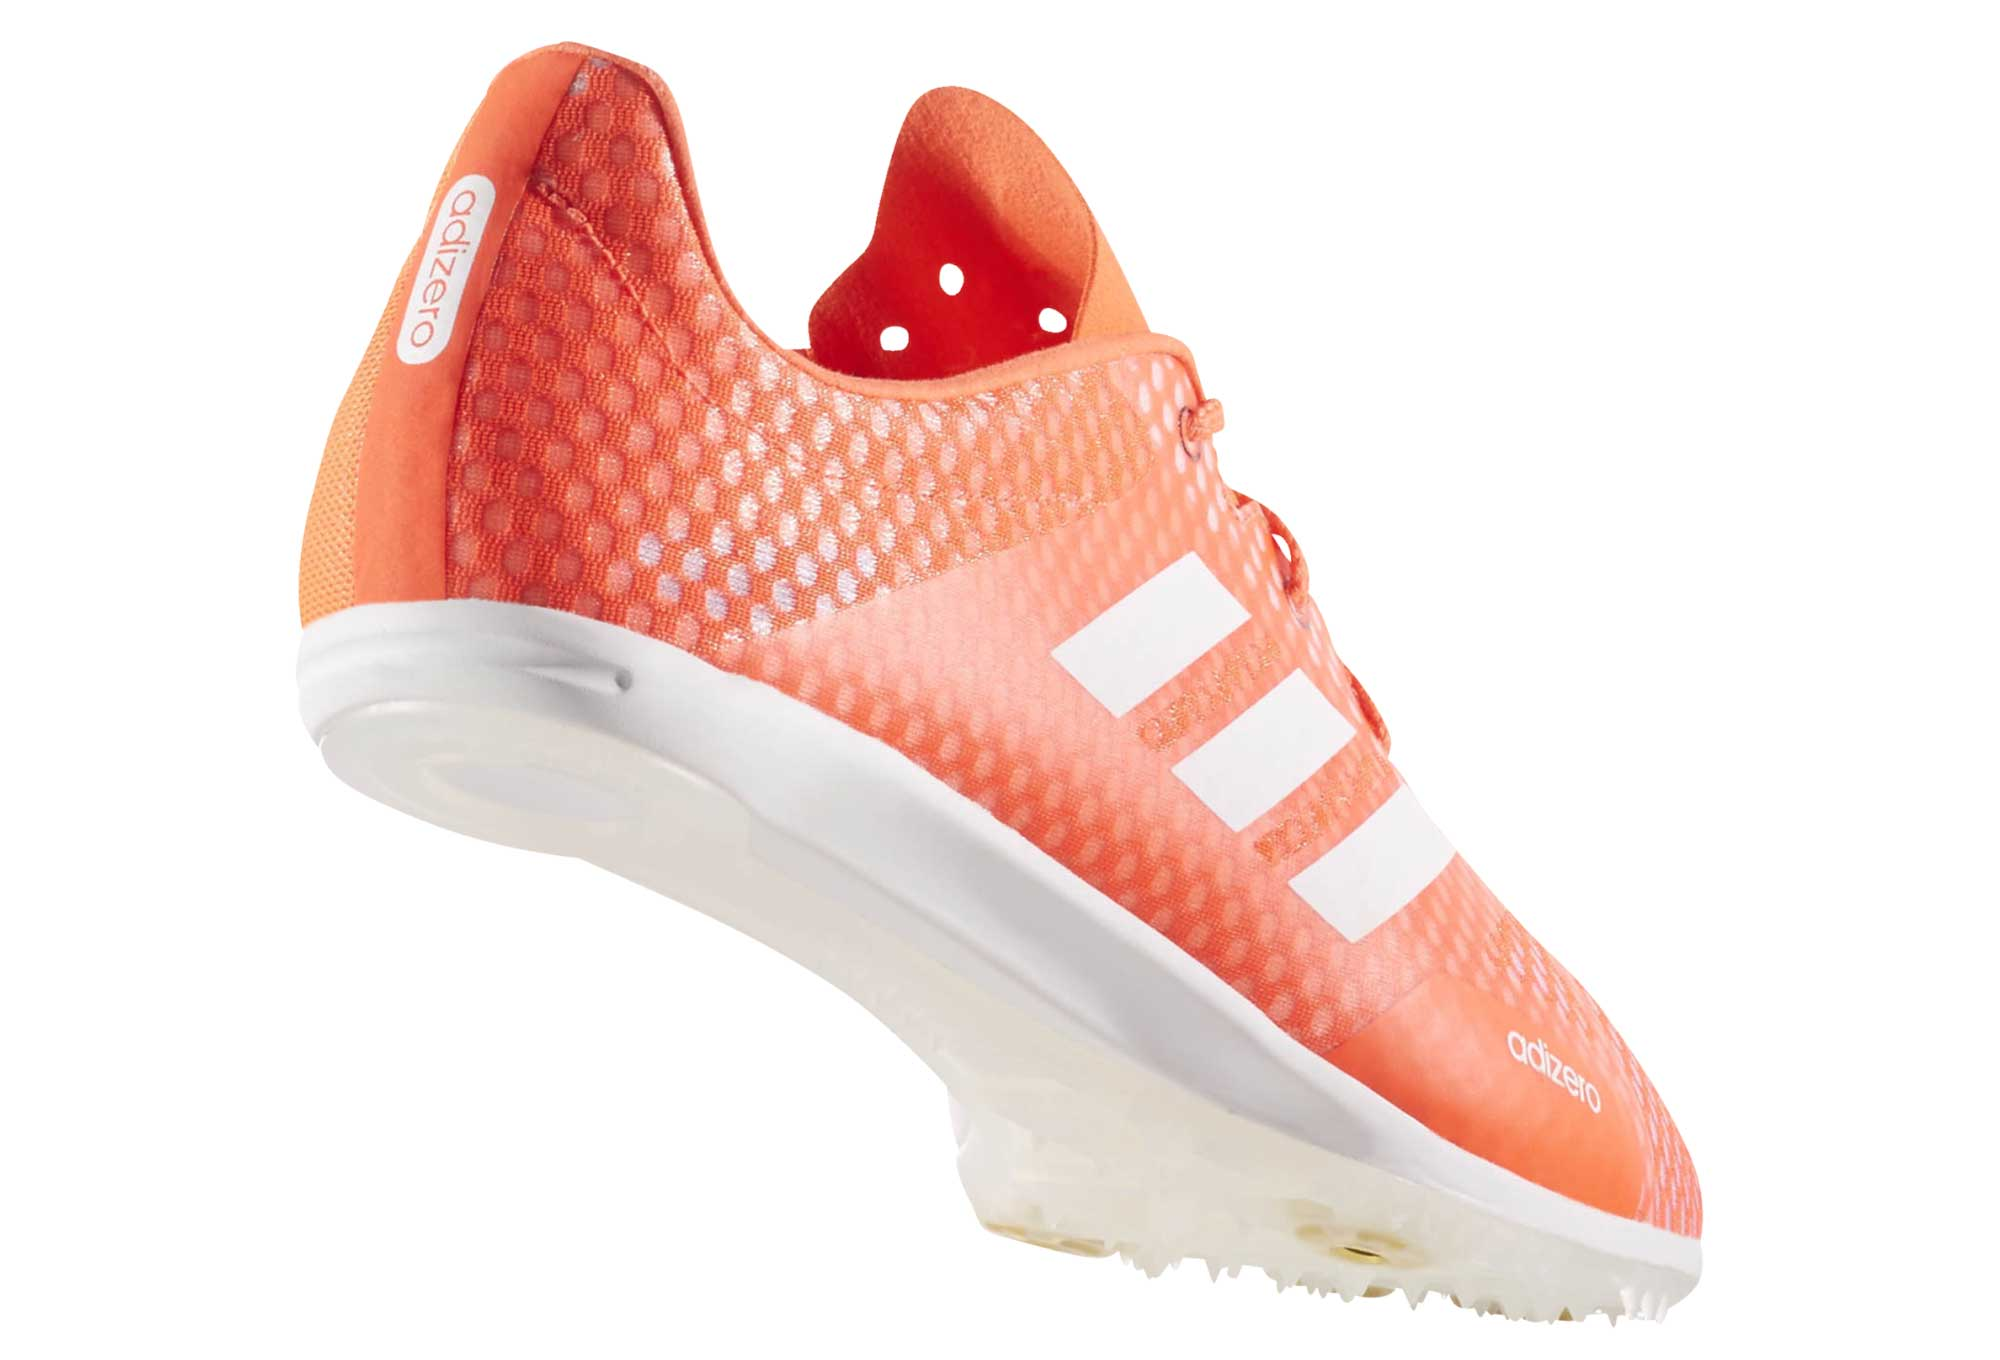 purchase cheap 60e11 59e04 Chaussures dAthlétisme adidas running Adizero Ambition 4 Orange